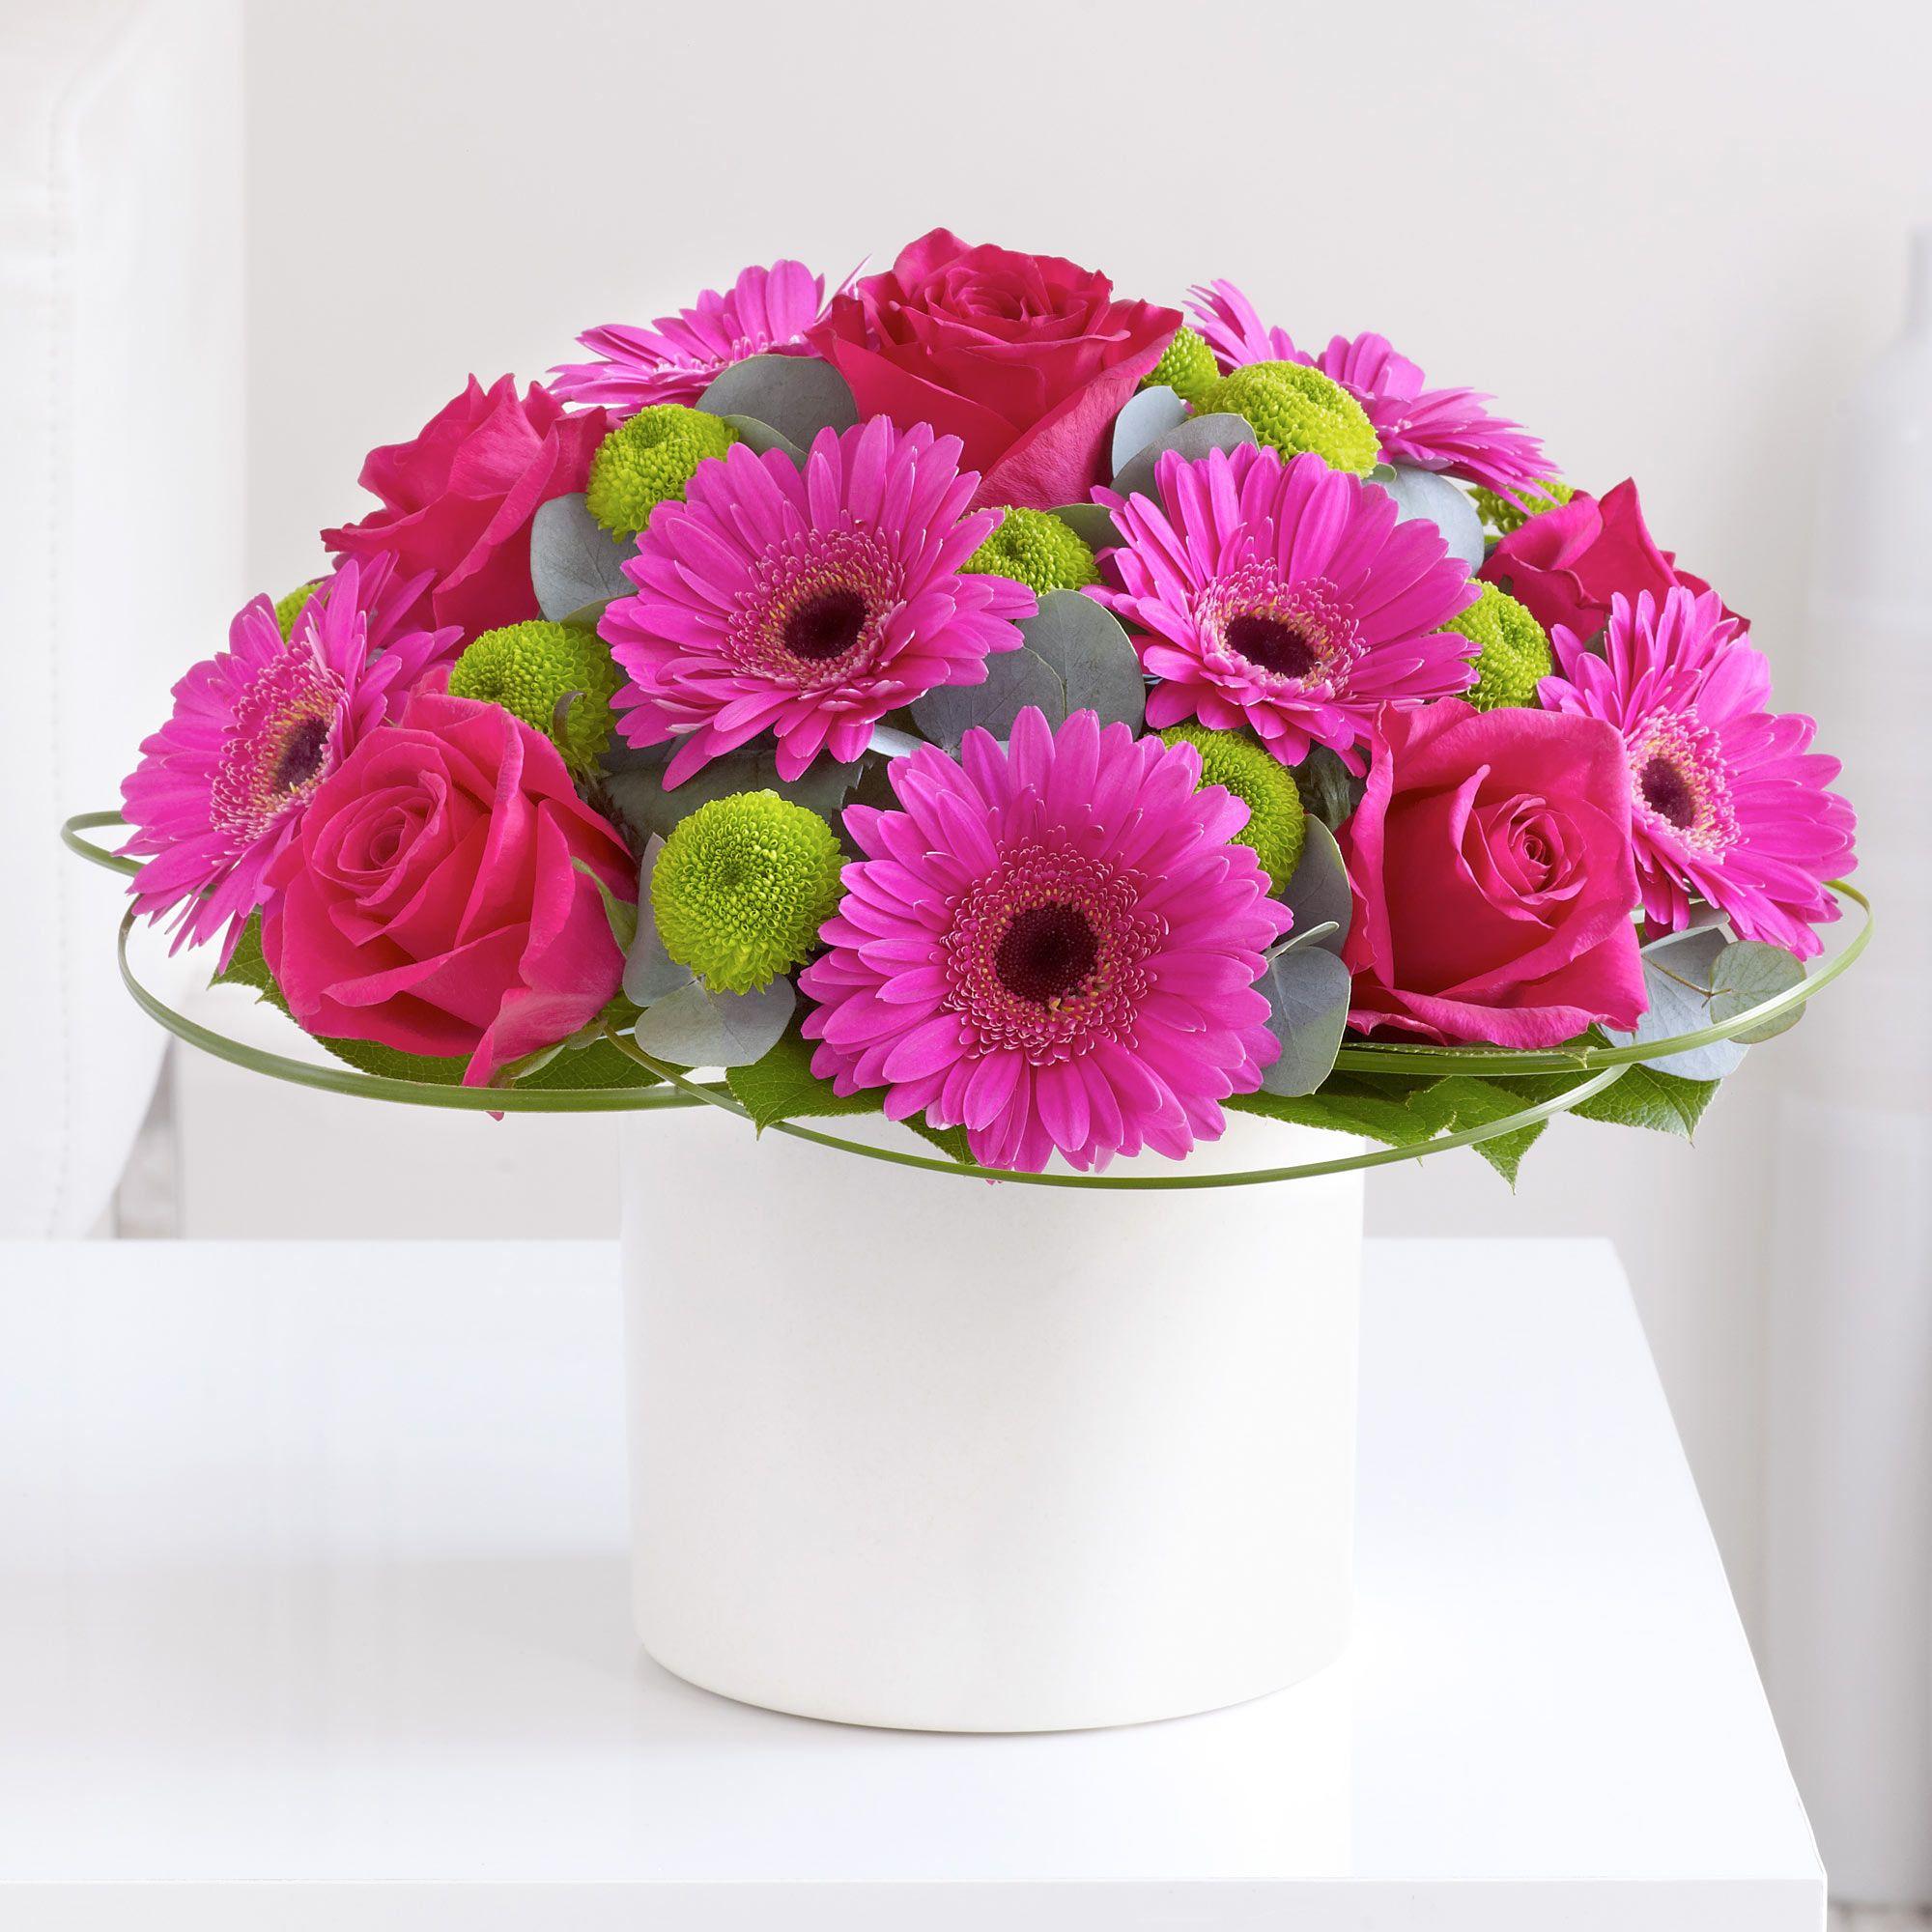 Flower Arrangements El Paso: This Pink Germini And Rose Arrangement Would Look